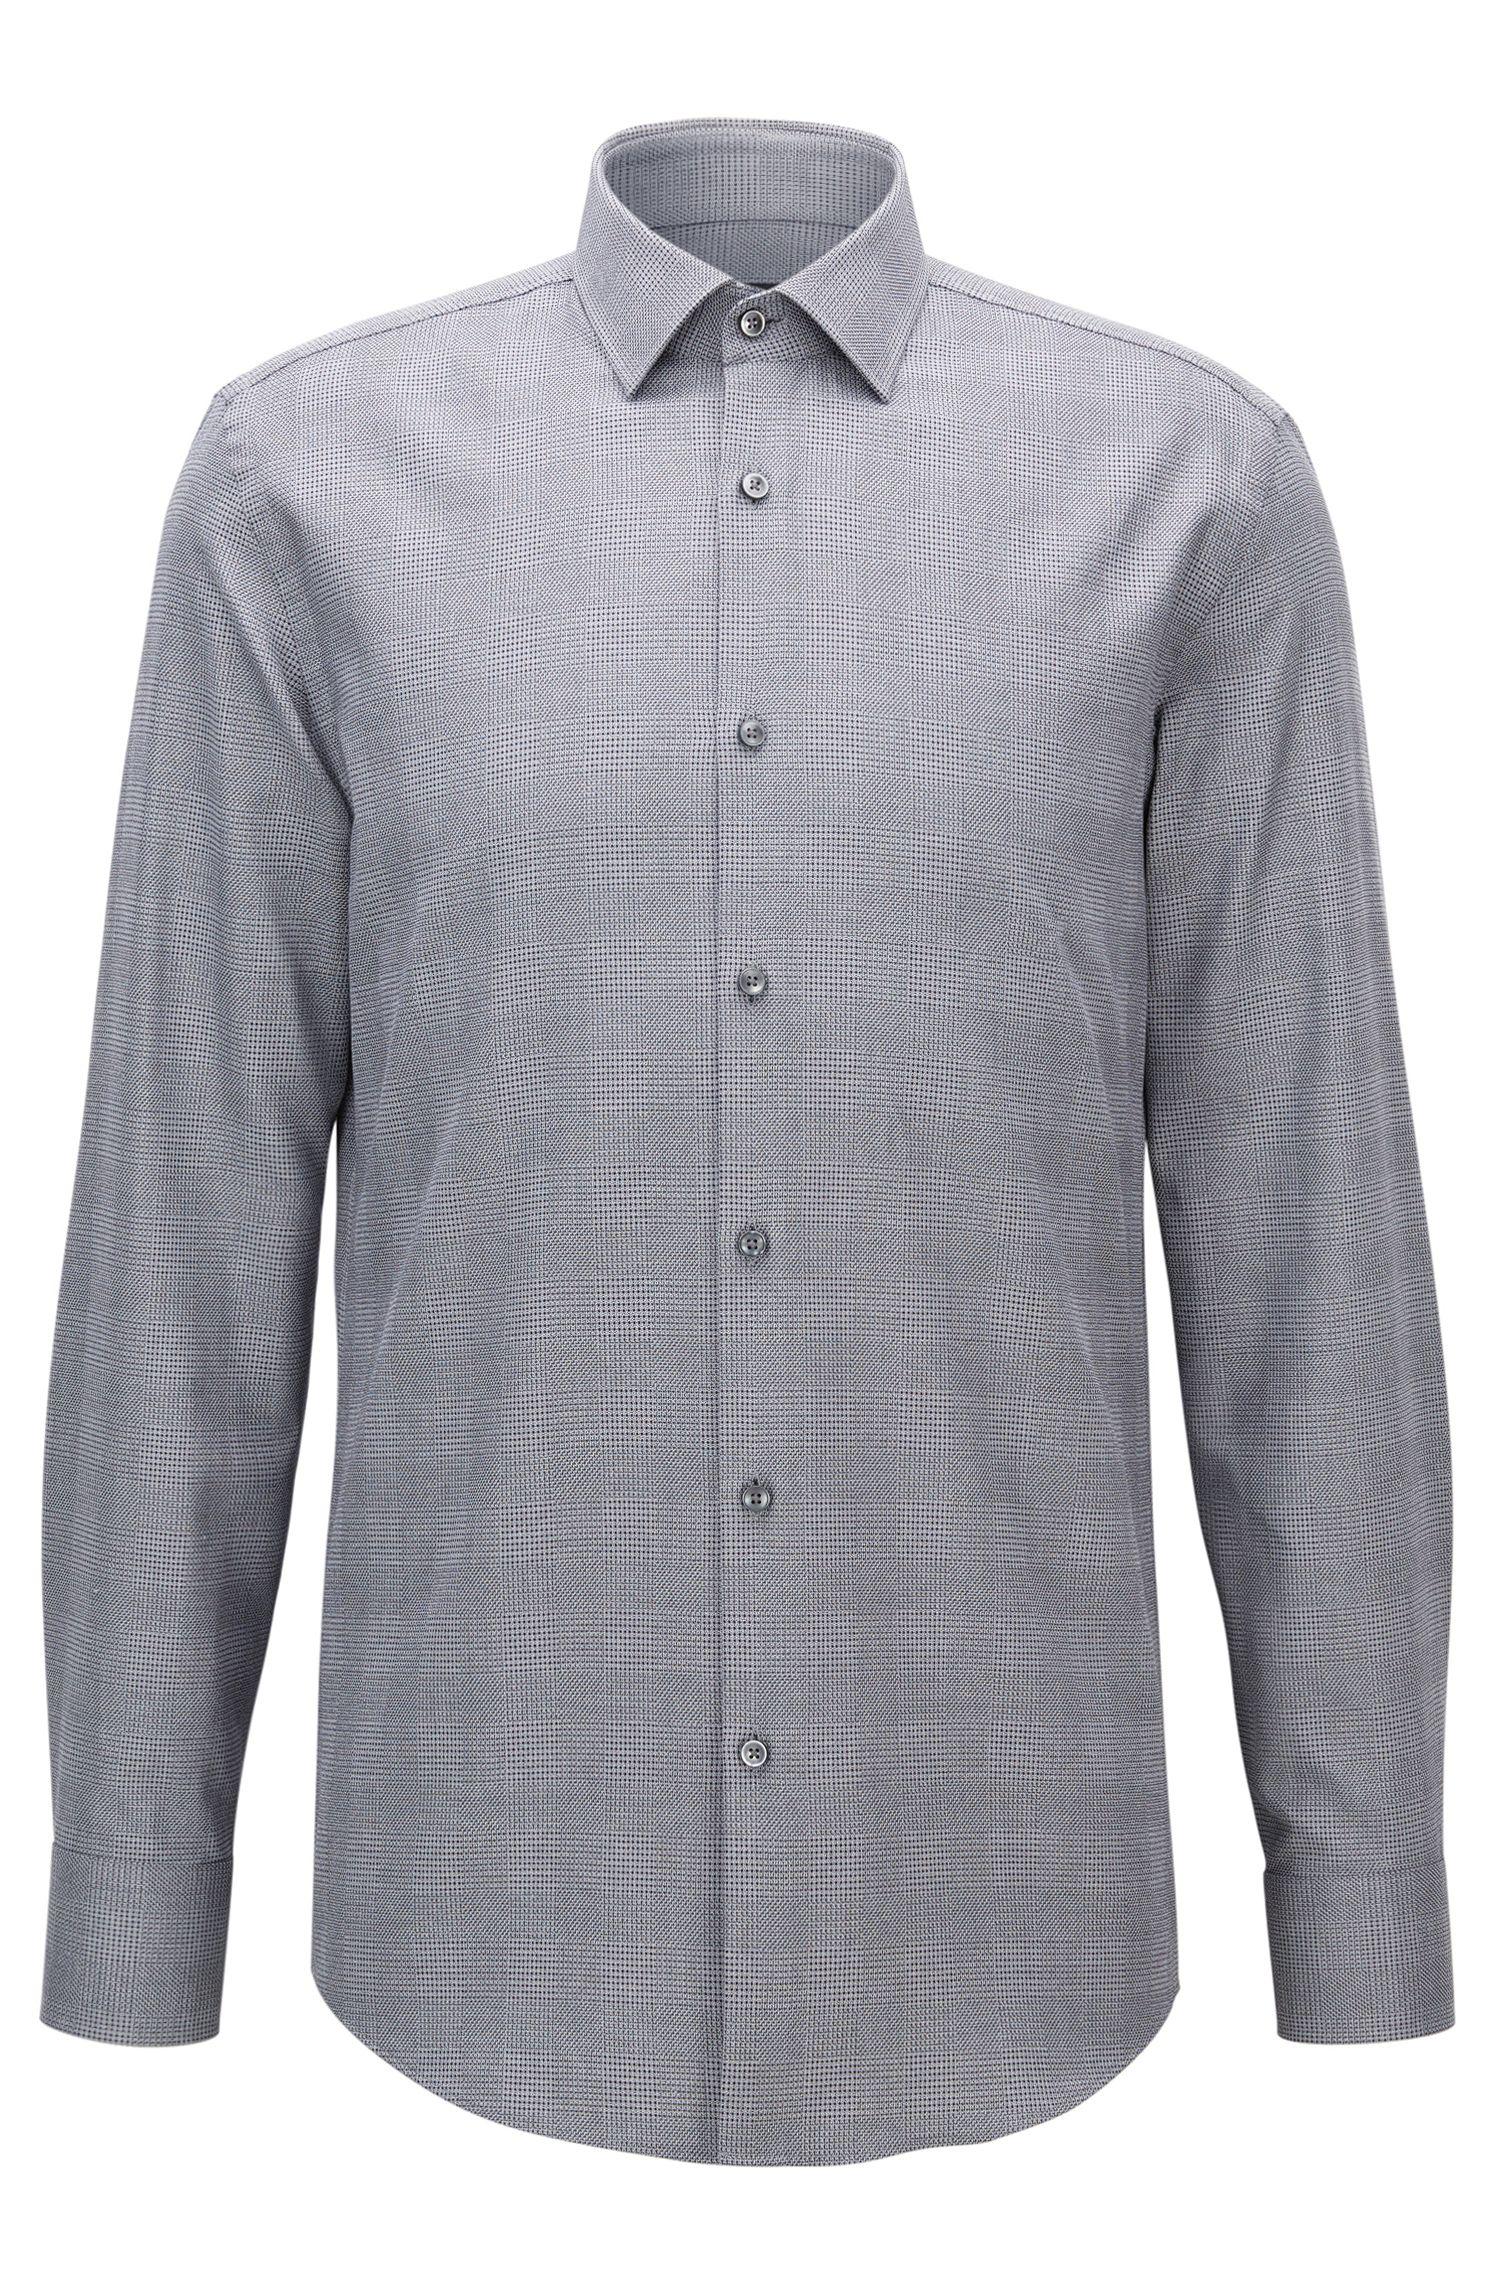 Plaid Cotton Dress Shirt, Slim Fi t| Jenno